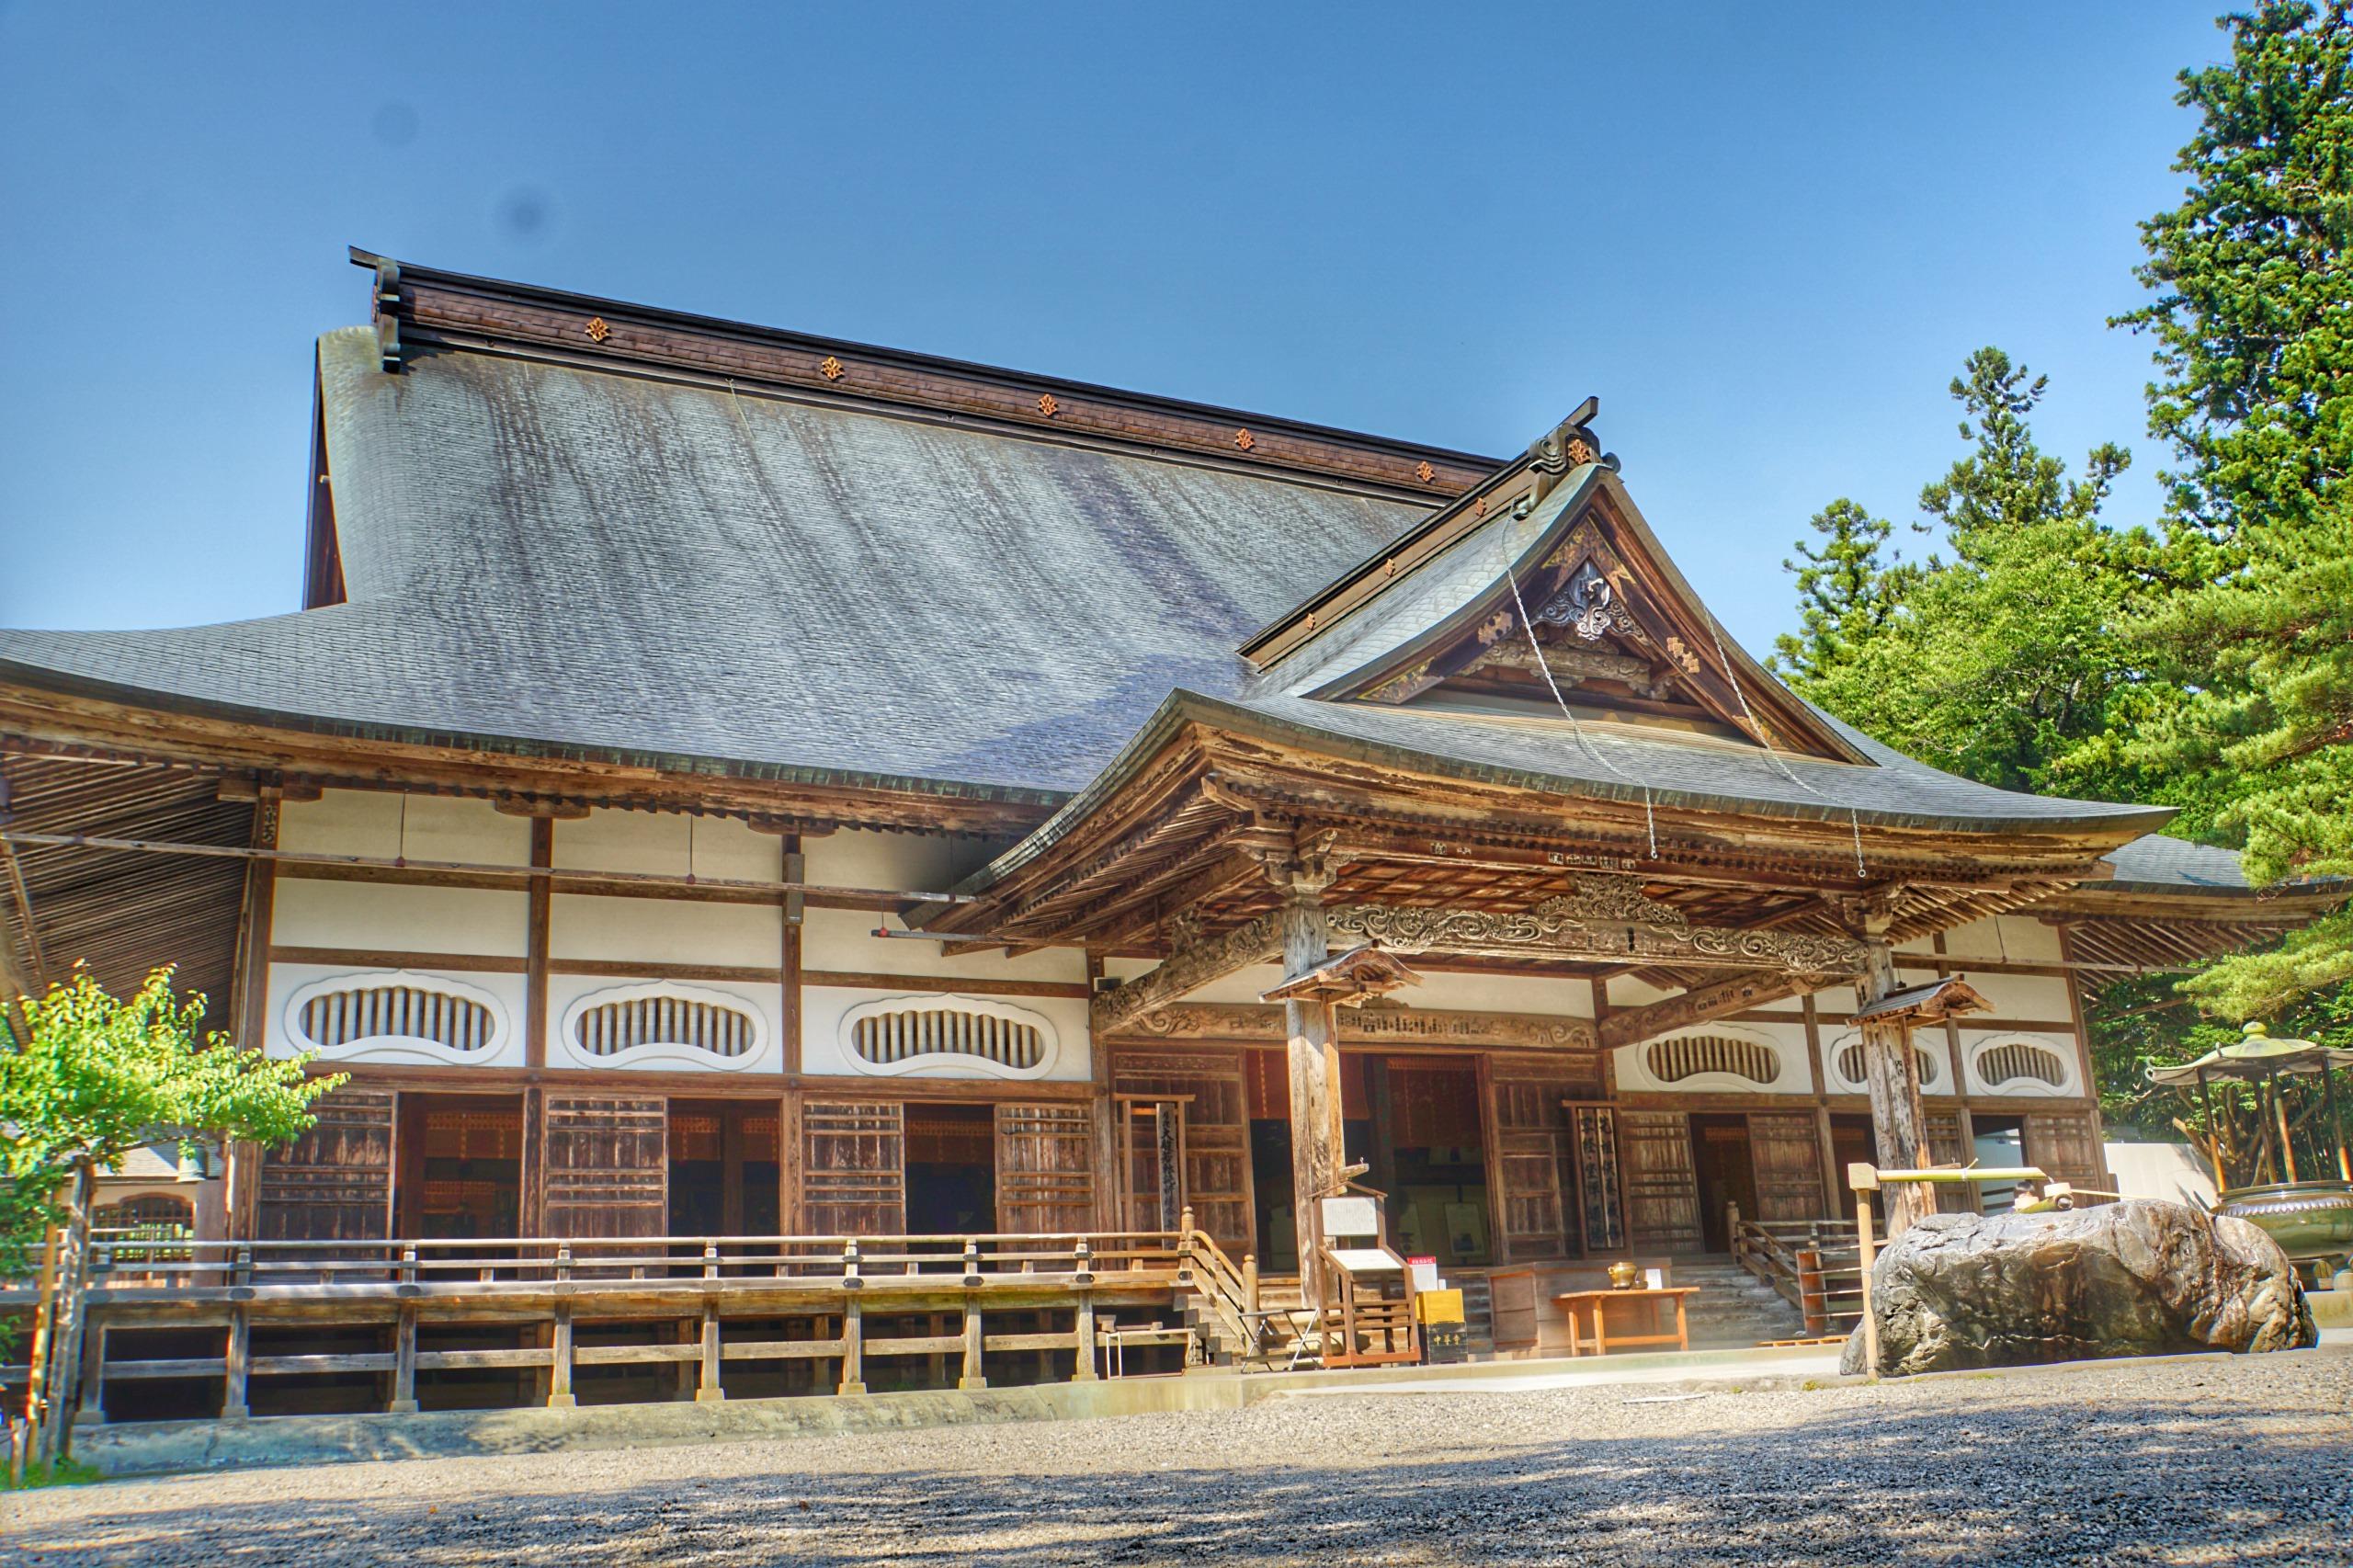 Visiting the historic monuments and sites of Hiraizumi, The Sekiyama Buddhist Temple